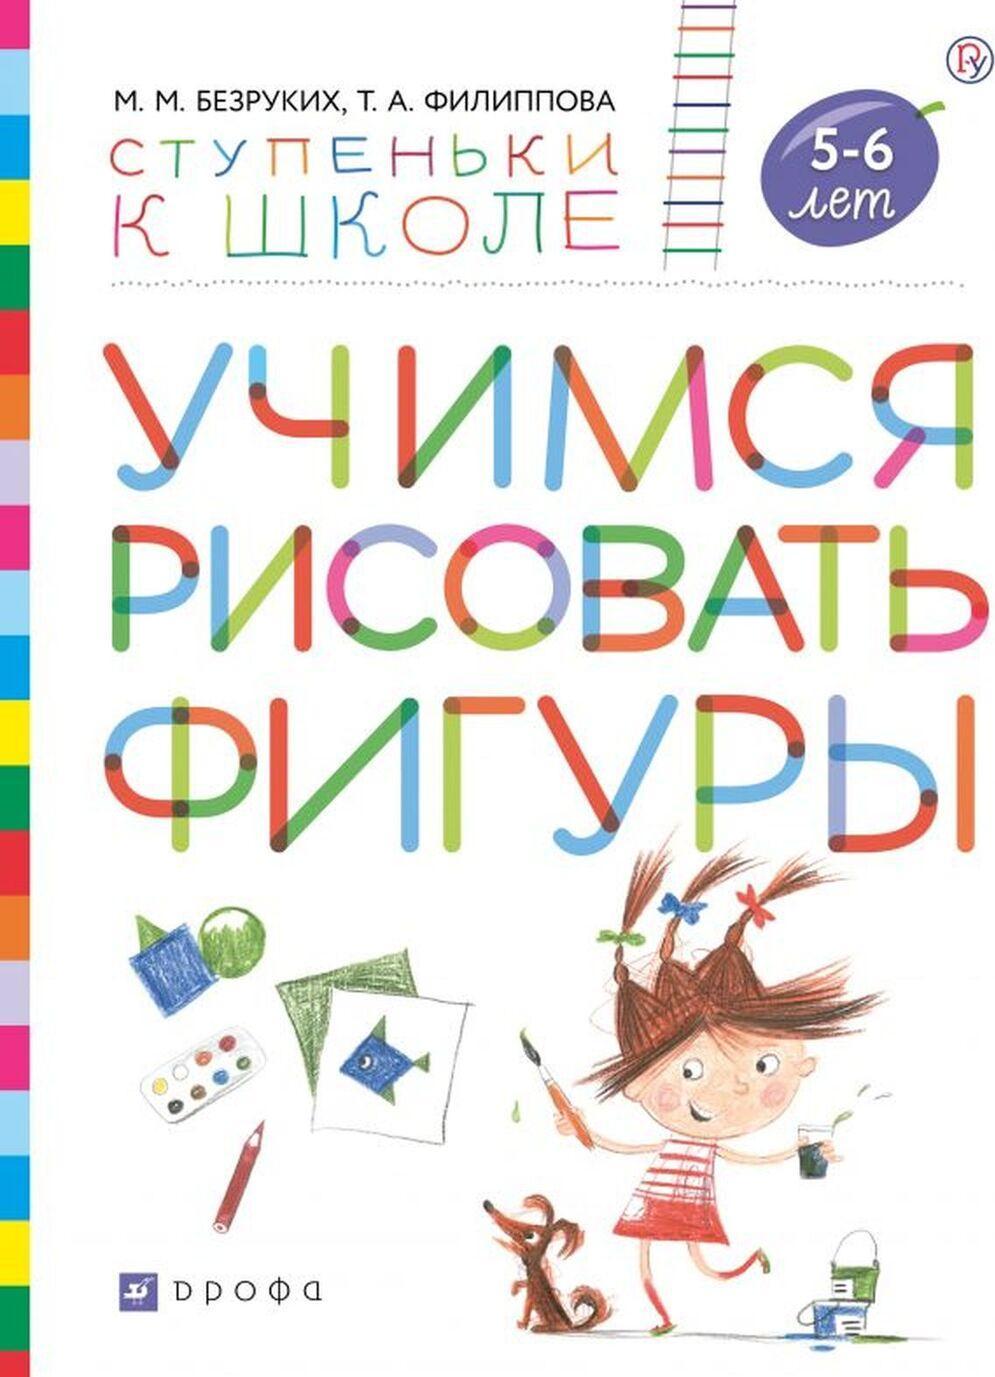 Uchimsja risovat figury. Posobie dlja detej 5-6 let | Bezrukikh Marjana Mikhajlovna, Filippova Tatjana Andreevna